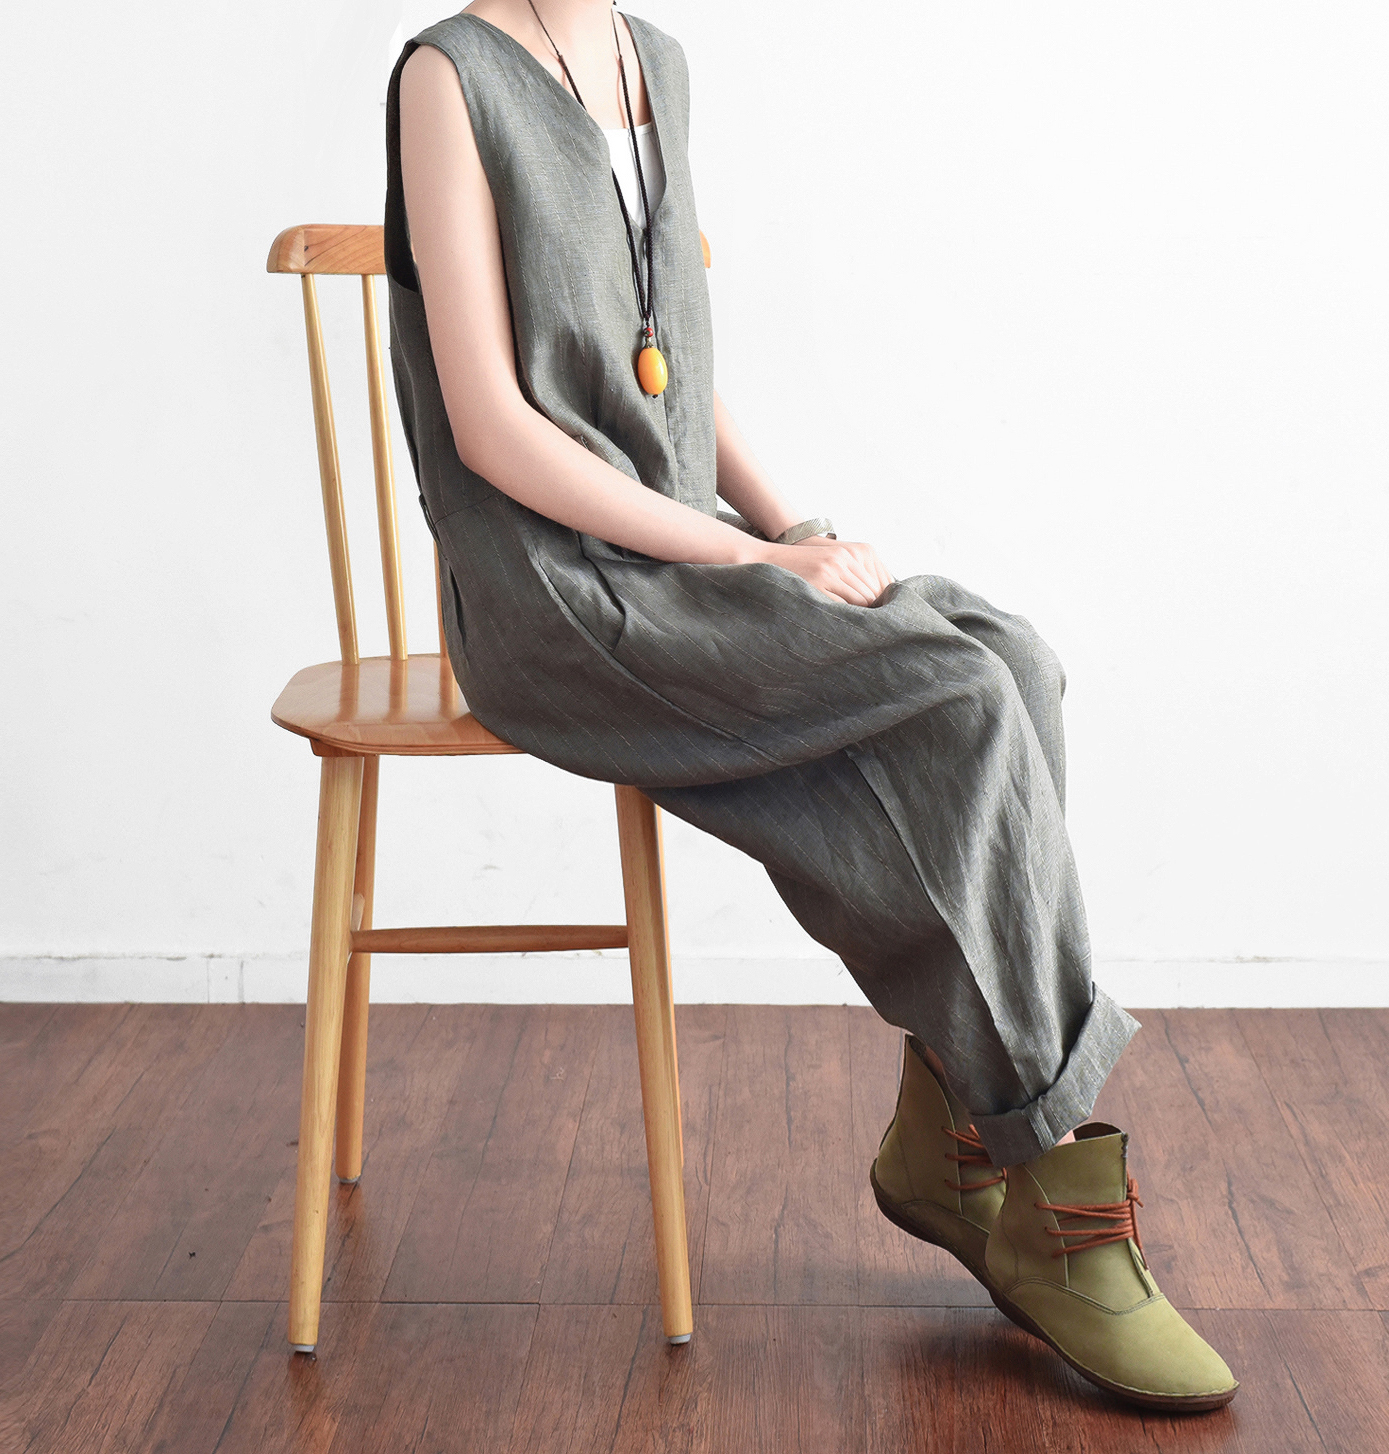 2018 Spring Women Jumpsuits Vintage New Casual Sleeveless Grey Linen Loose Original Design Plus Size Women Bodysuits